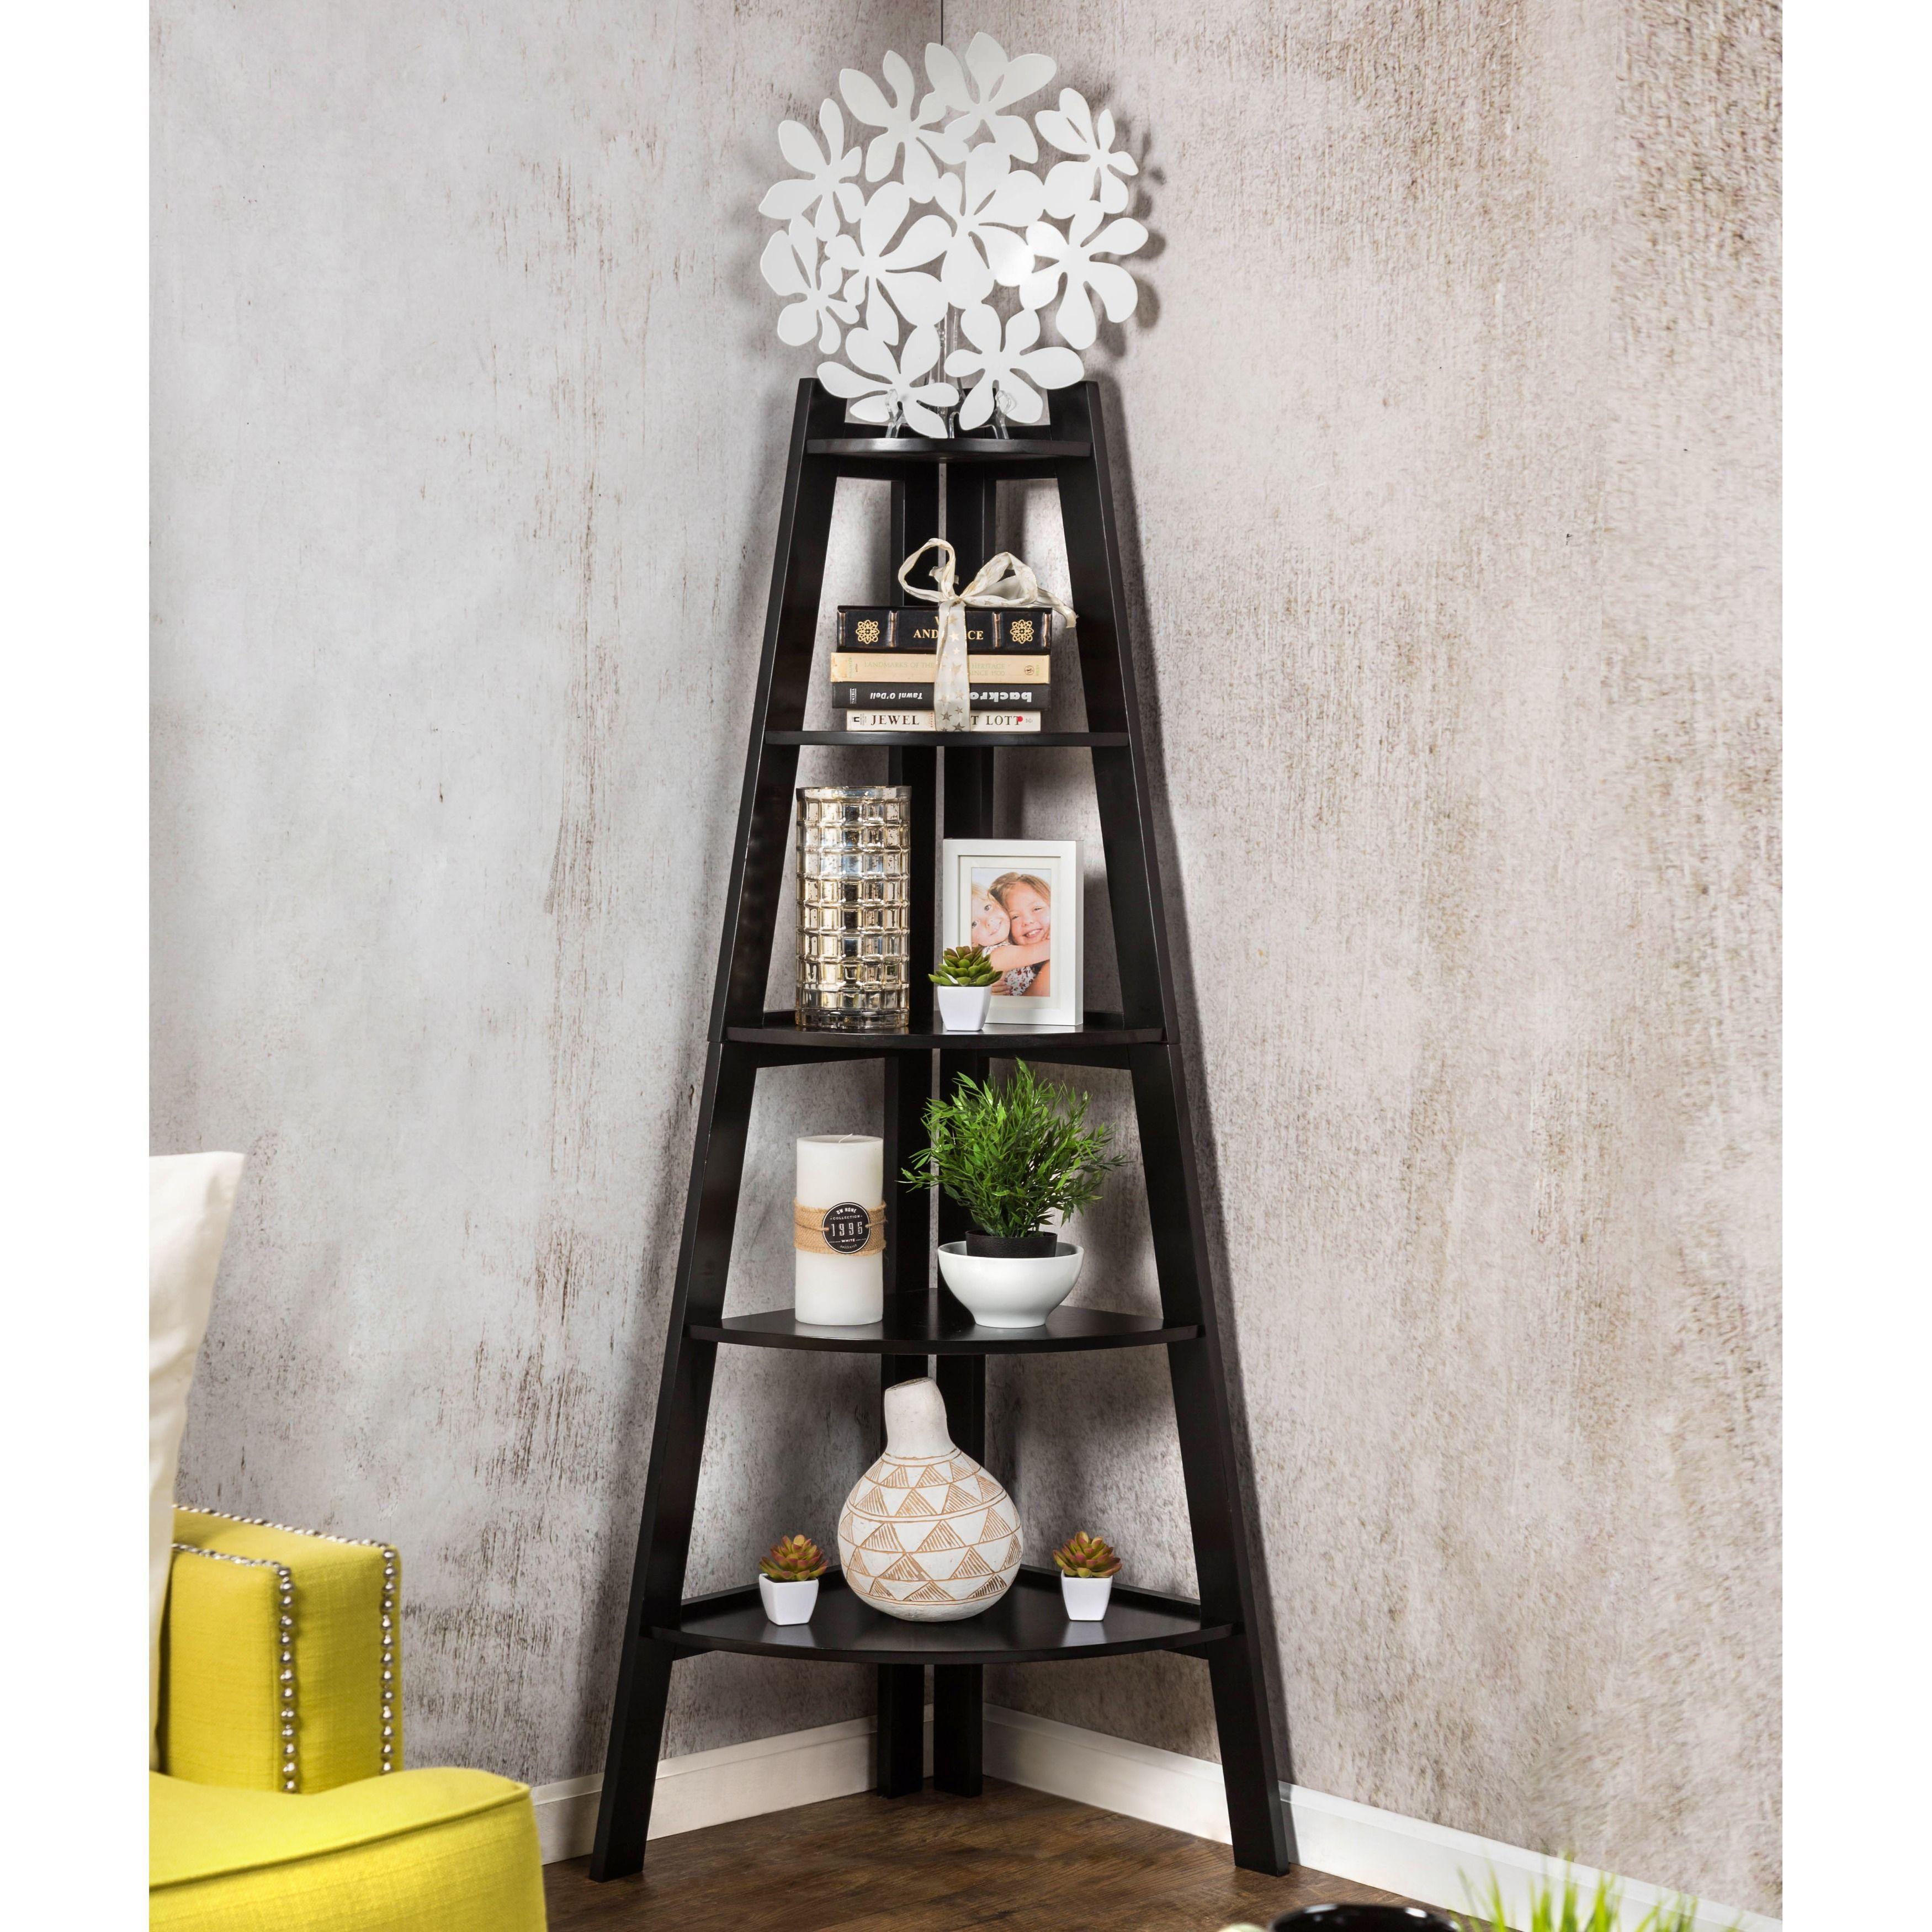 Furniture of america kiki tier corner ladder display bookcase